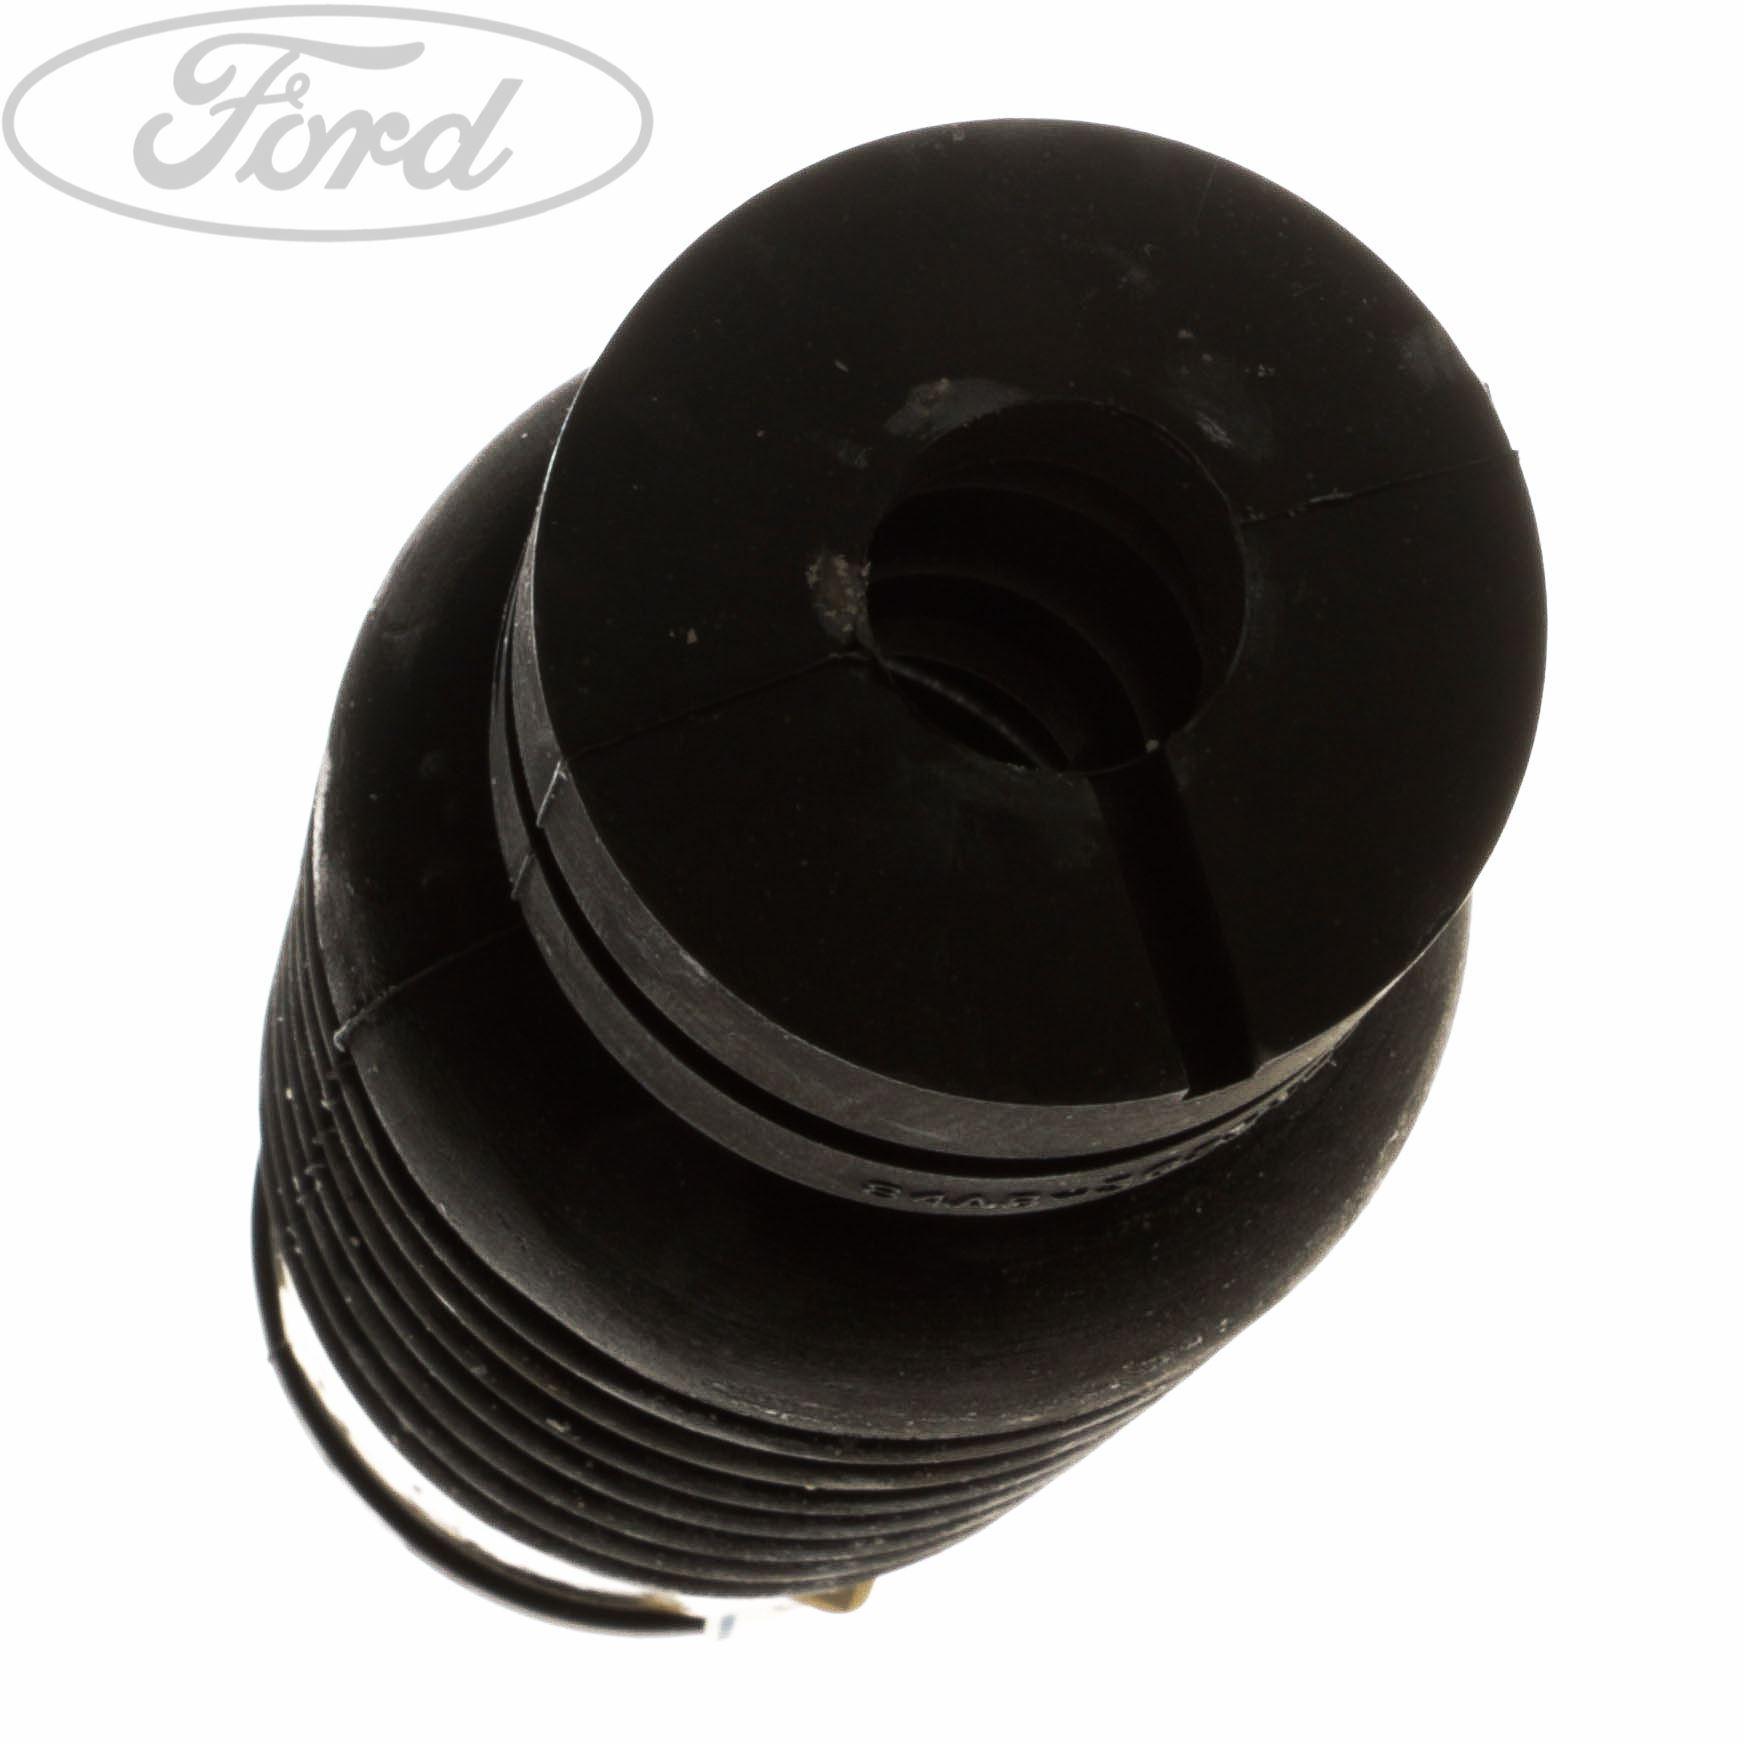 Genuine Ford Escort MK4 Front Suspension Bump Stop 6136219